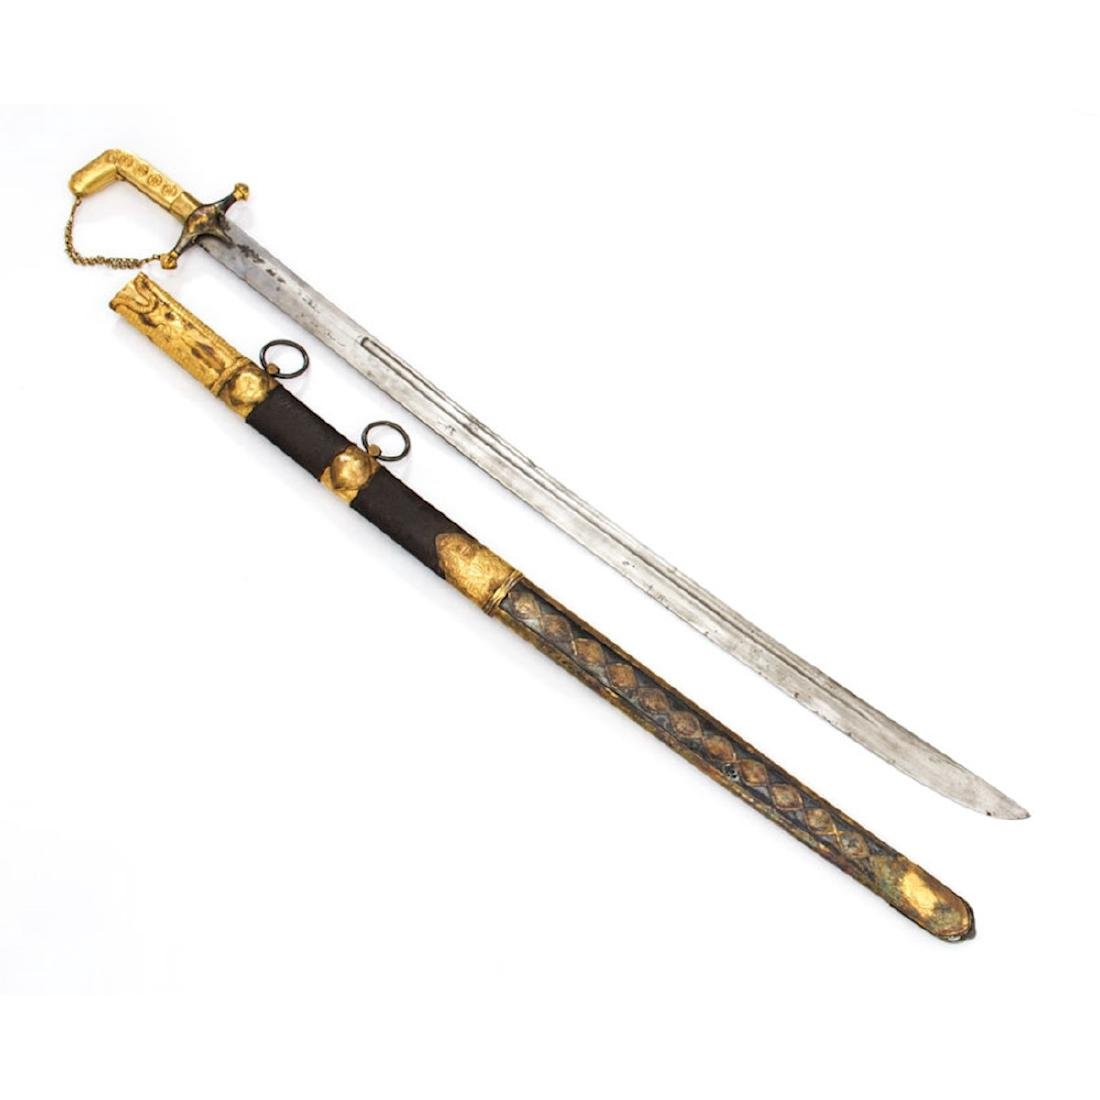 PRESENTATION SAIF SWORD WITH GOLD MOUNTS